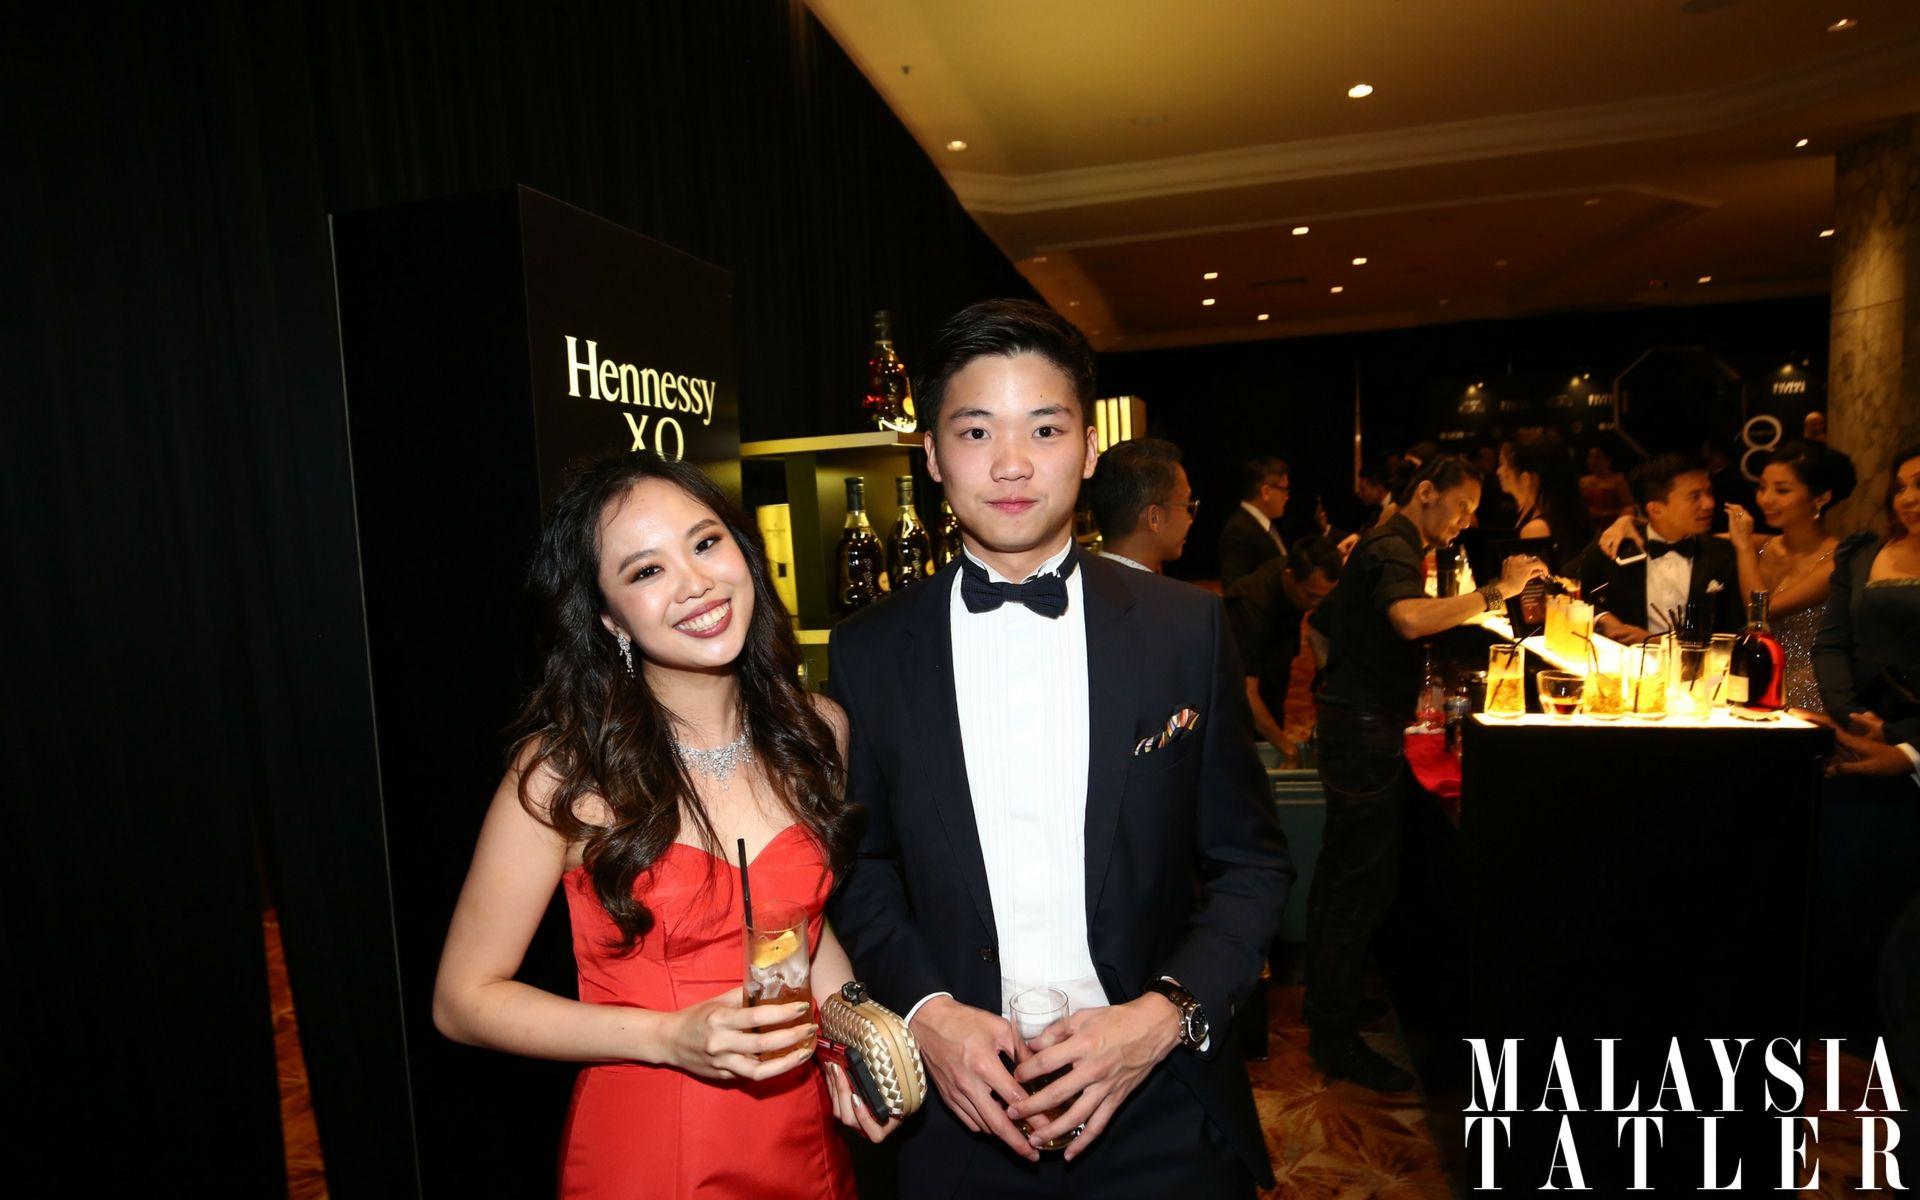 Yap Po Leen and Garvy Beh